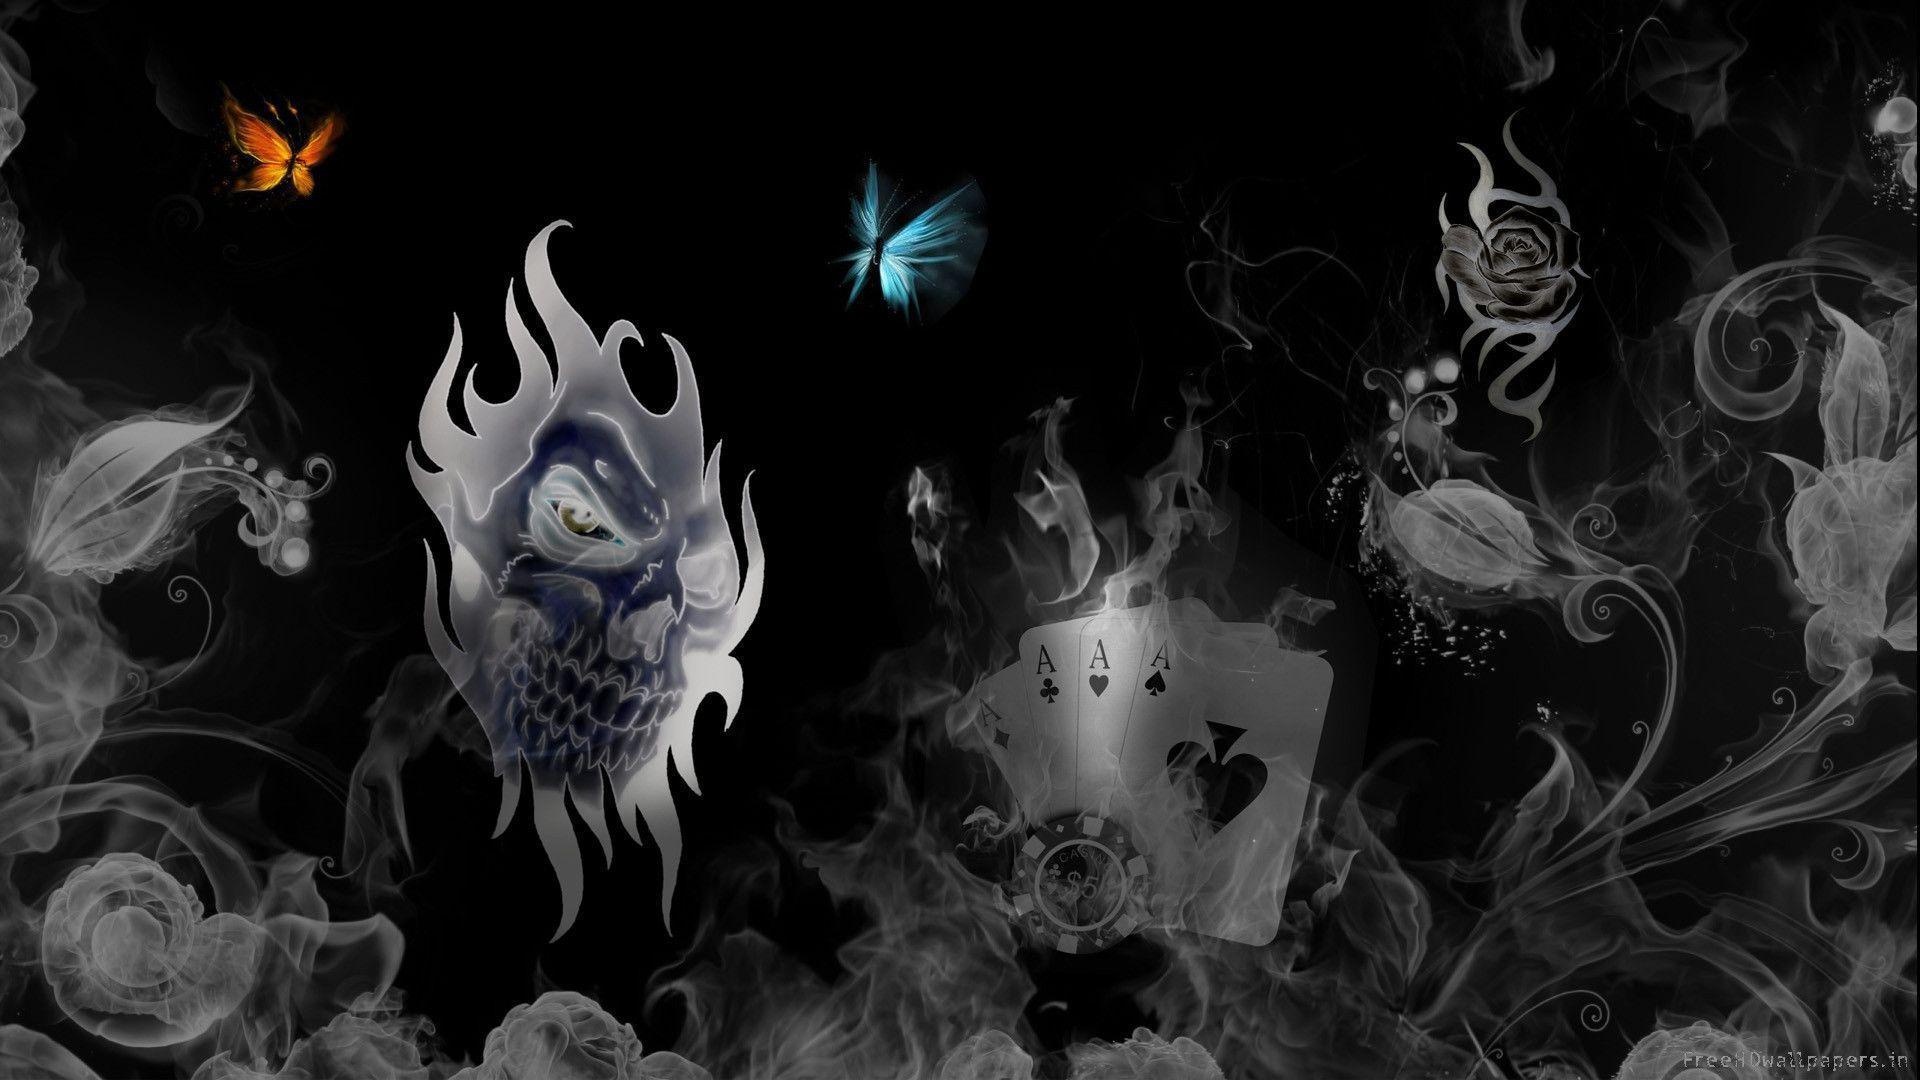 Skull On Fire Wallpaper Free Download